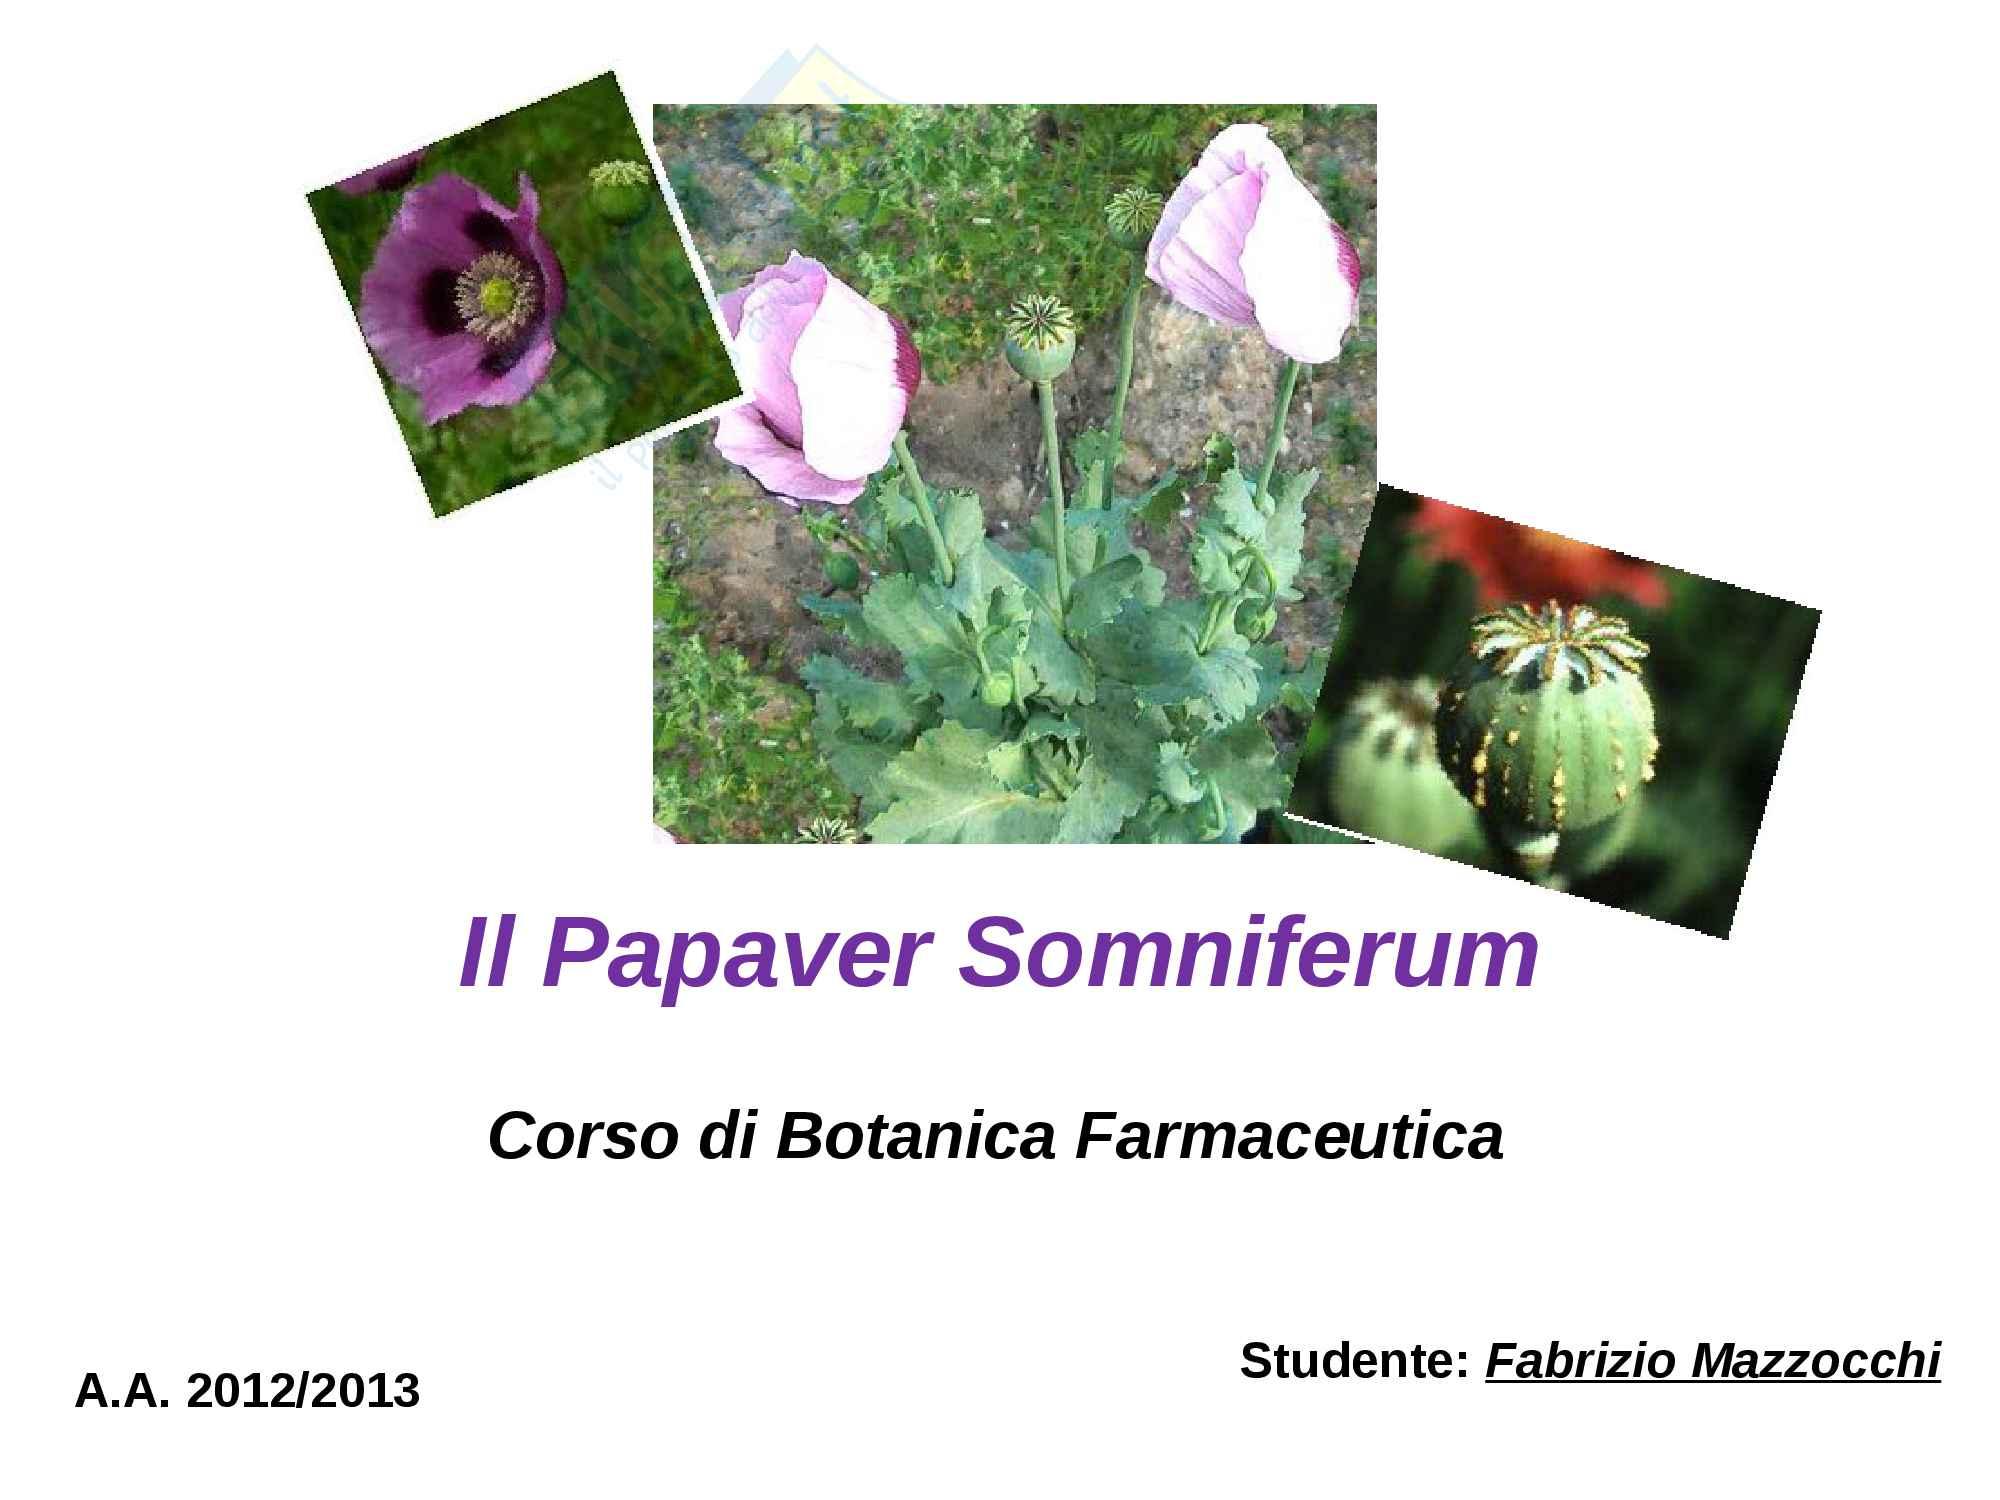 Tesina di Botanica Farmaceutica, prof. Serafini Mauro